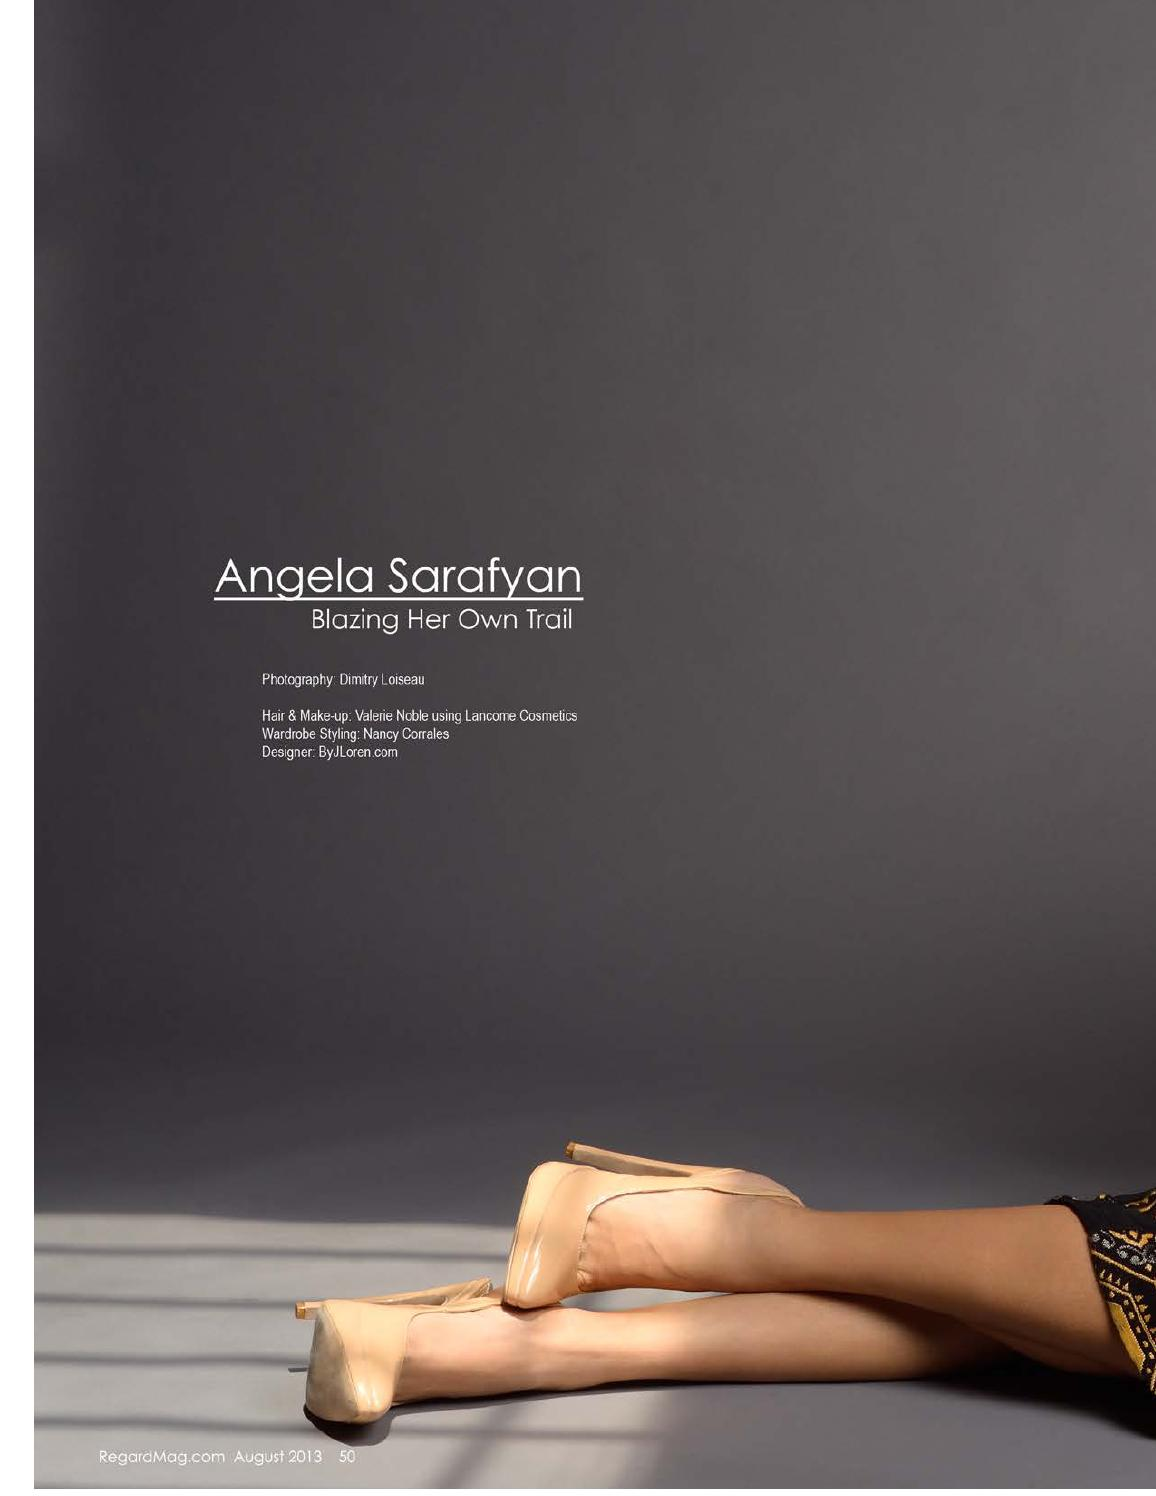 Angela Sarafyan Regard magazine